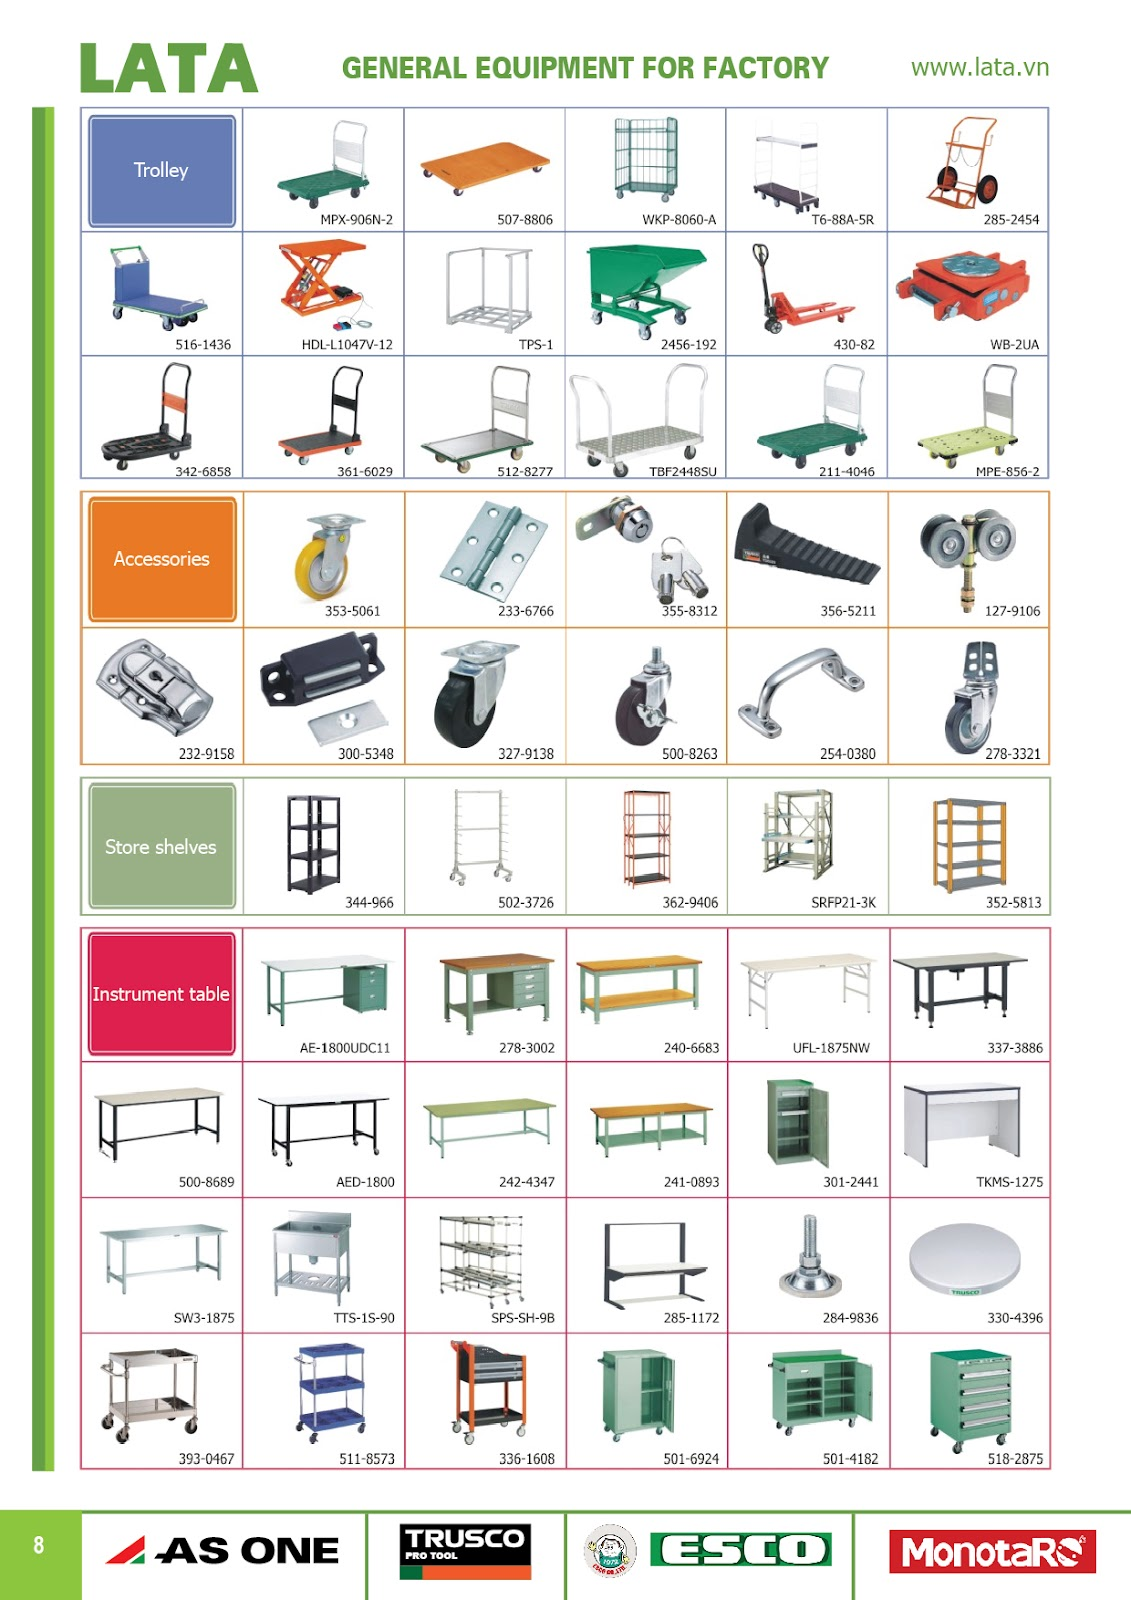 Catalogue LATA (T11)_8.jpg